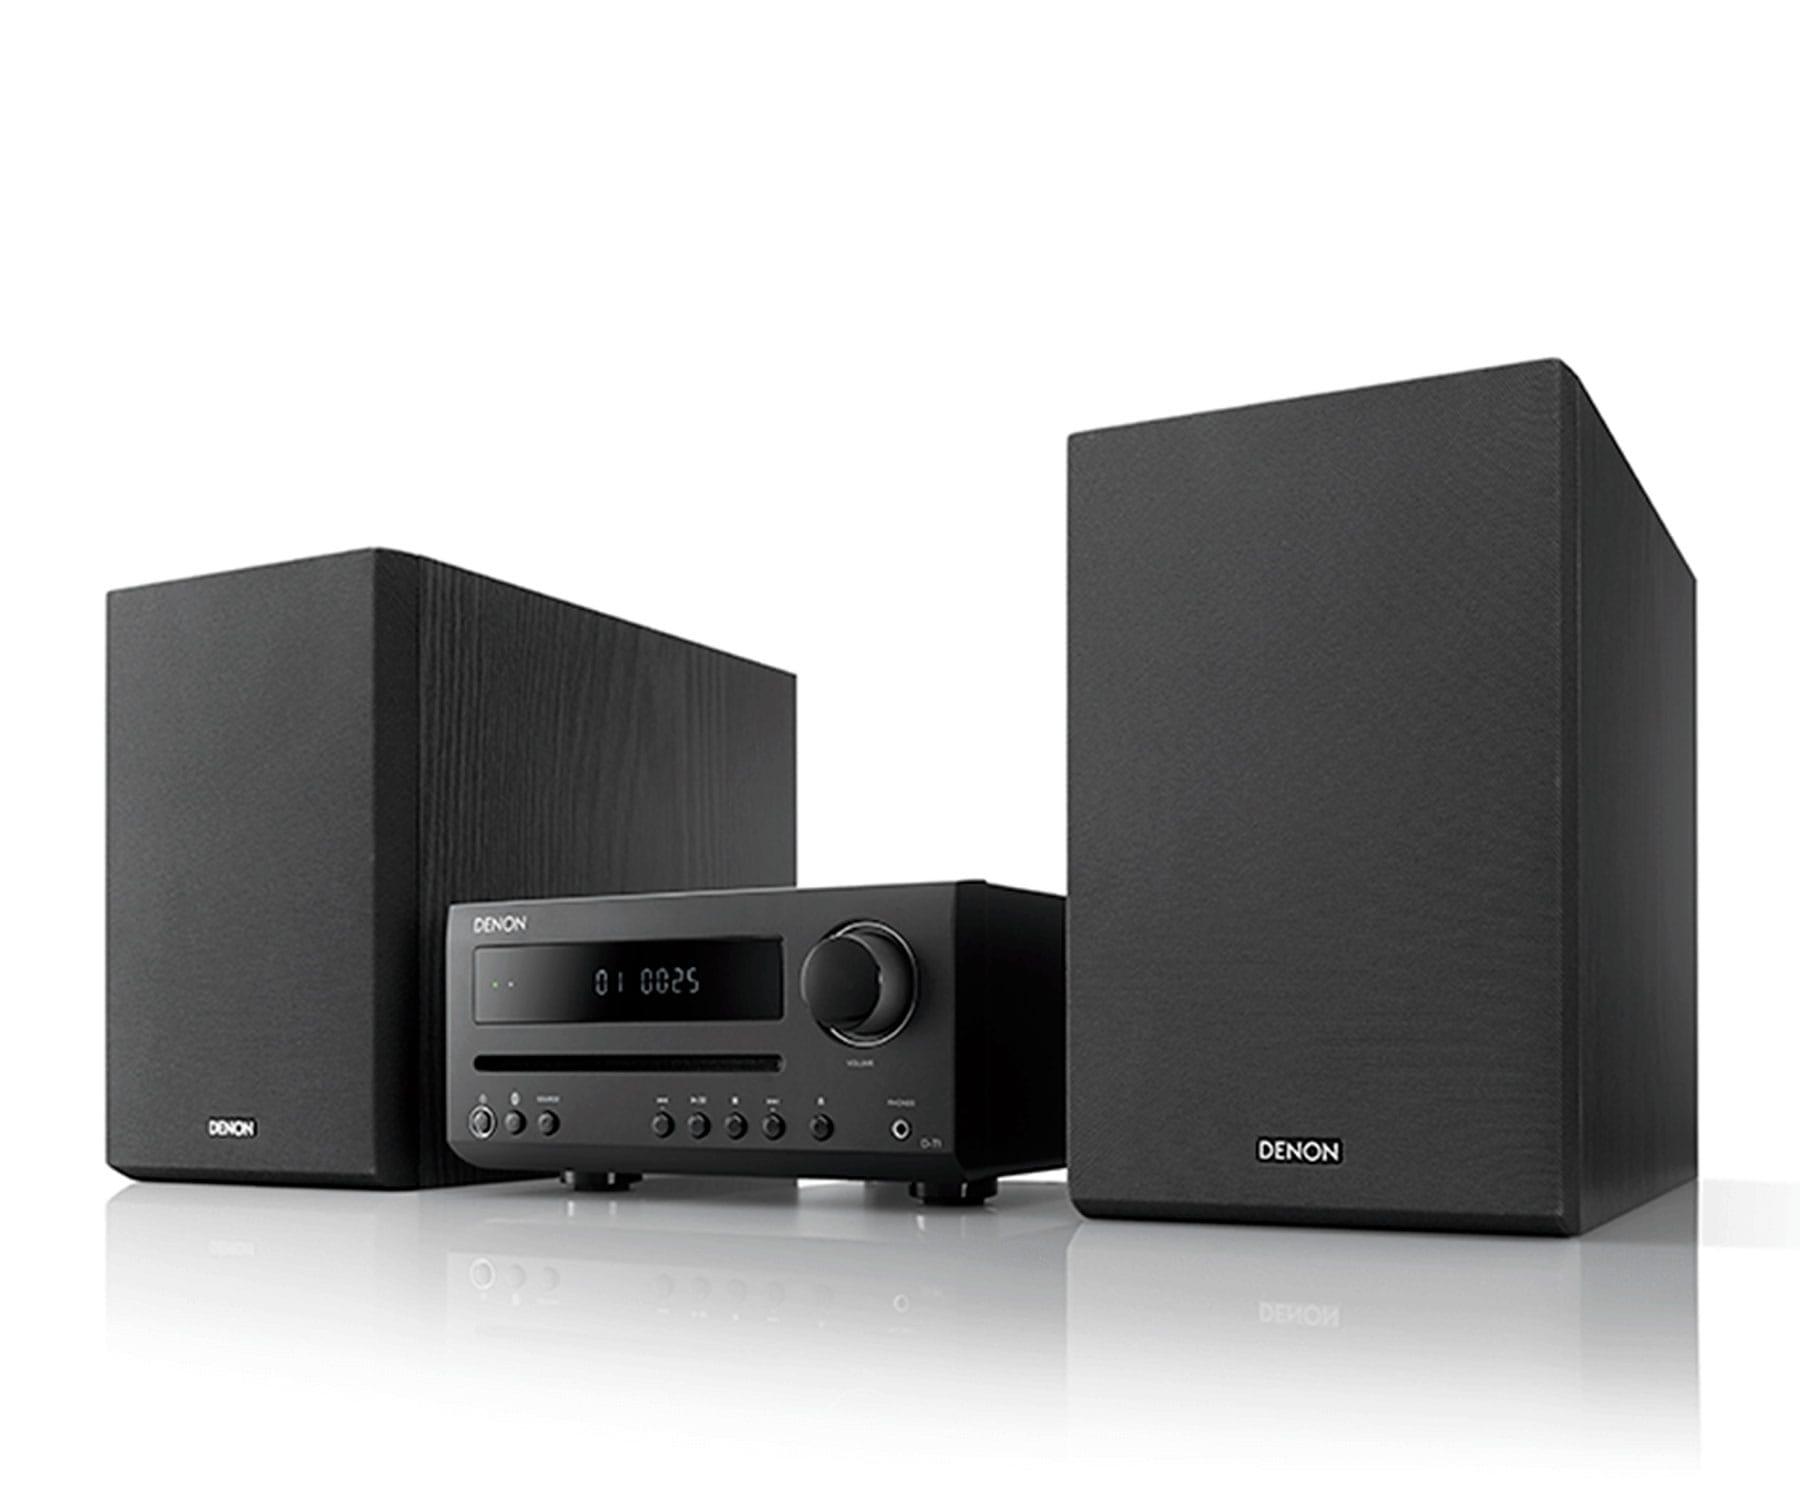 Denon DT1 BK Negro/2x15W/Minisistema Hi-Fi/CD/Radio FM/AM/Bluetooth